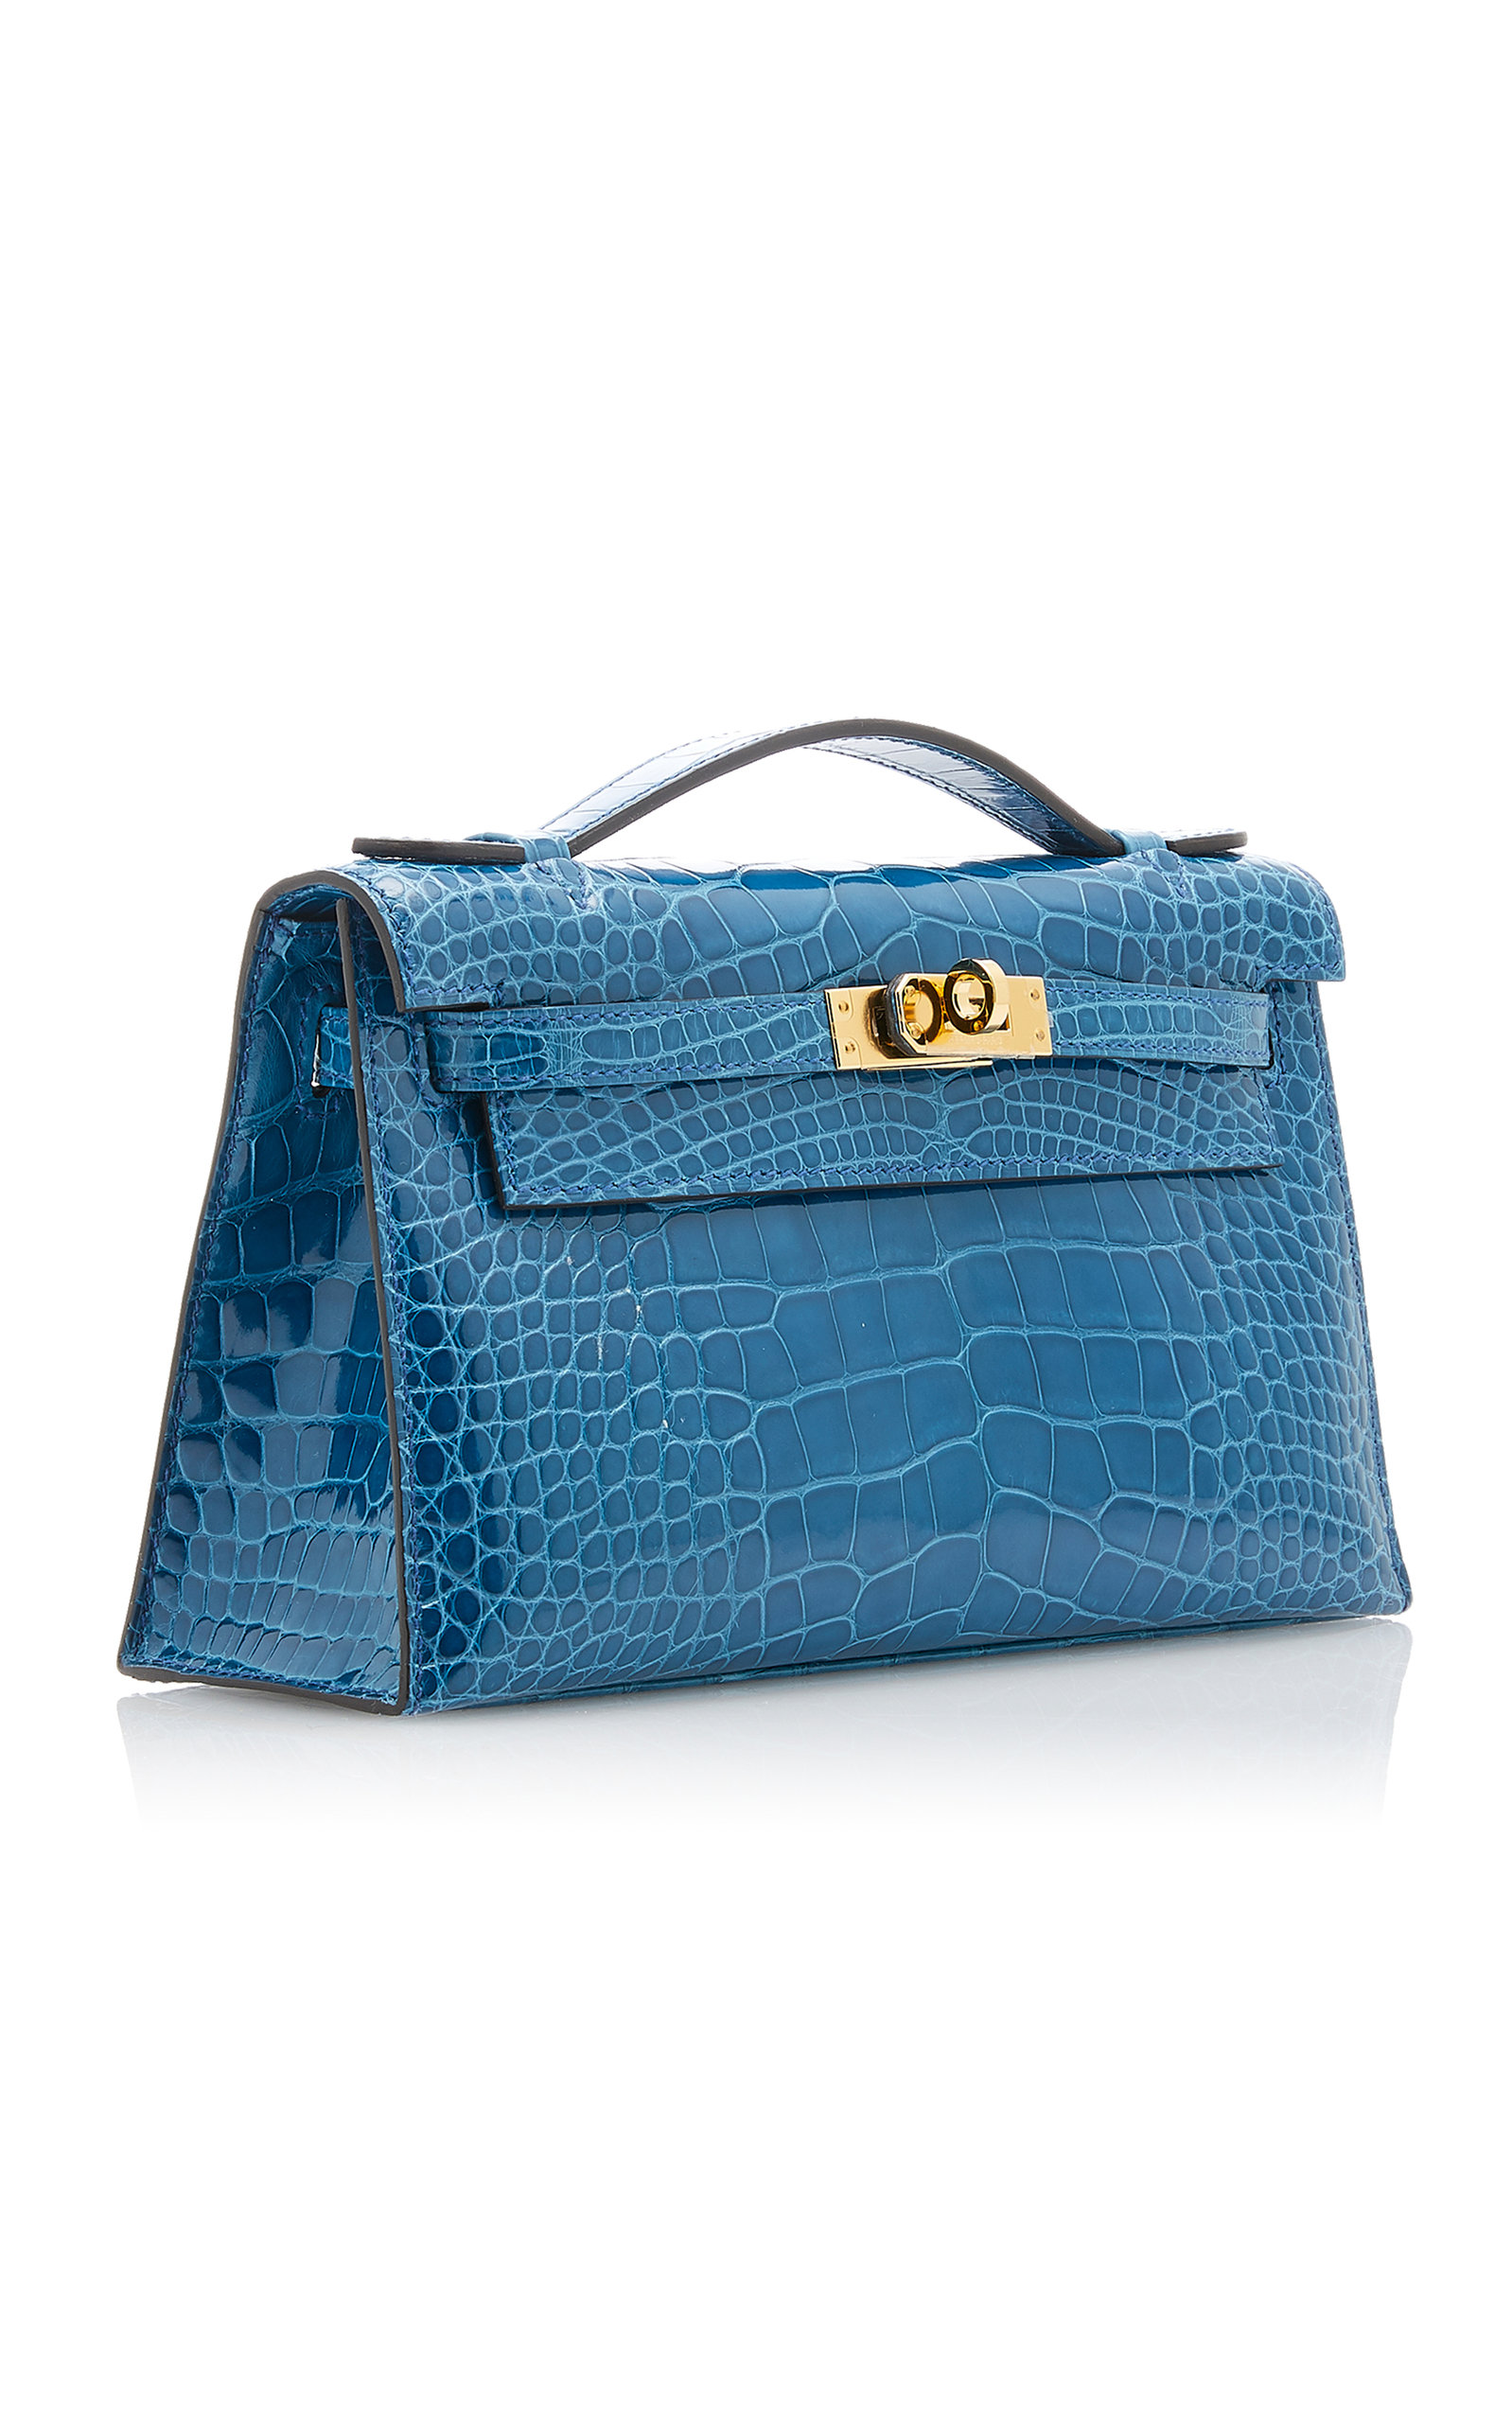 bc3fef805fa8 Hermès Vintage by Heritage AuctionsHermès Shiny Mykonos Alligator Kelly  Pochette. CLOSE. Loading. Loading. Loading